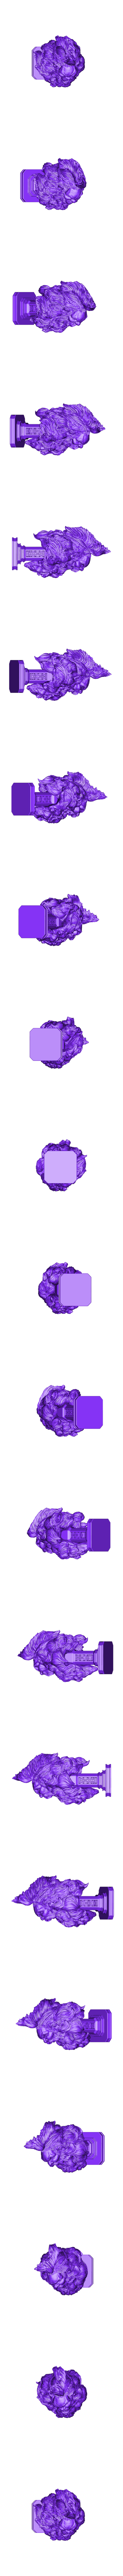 BeardedYell_Low_137k.stl Download free STL file The Bearded Yell • 3D printable object, bendansie